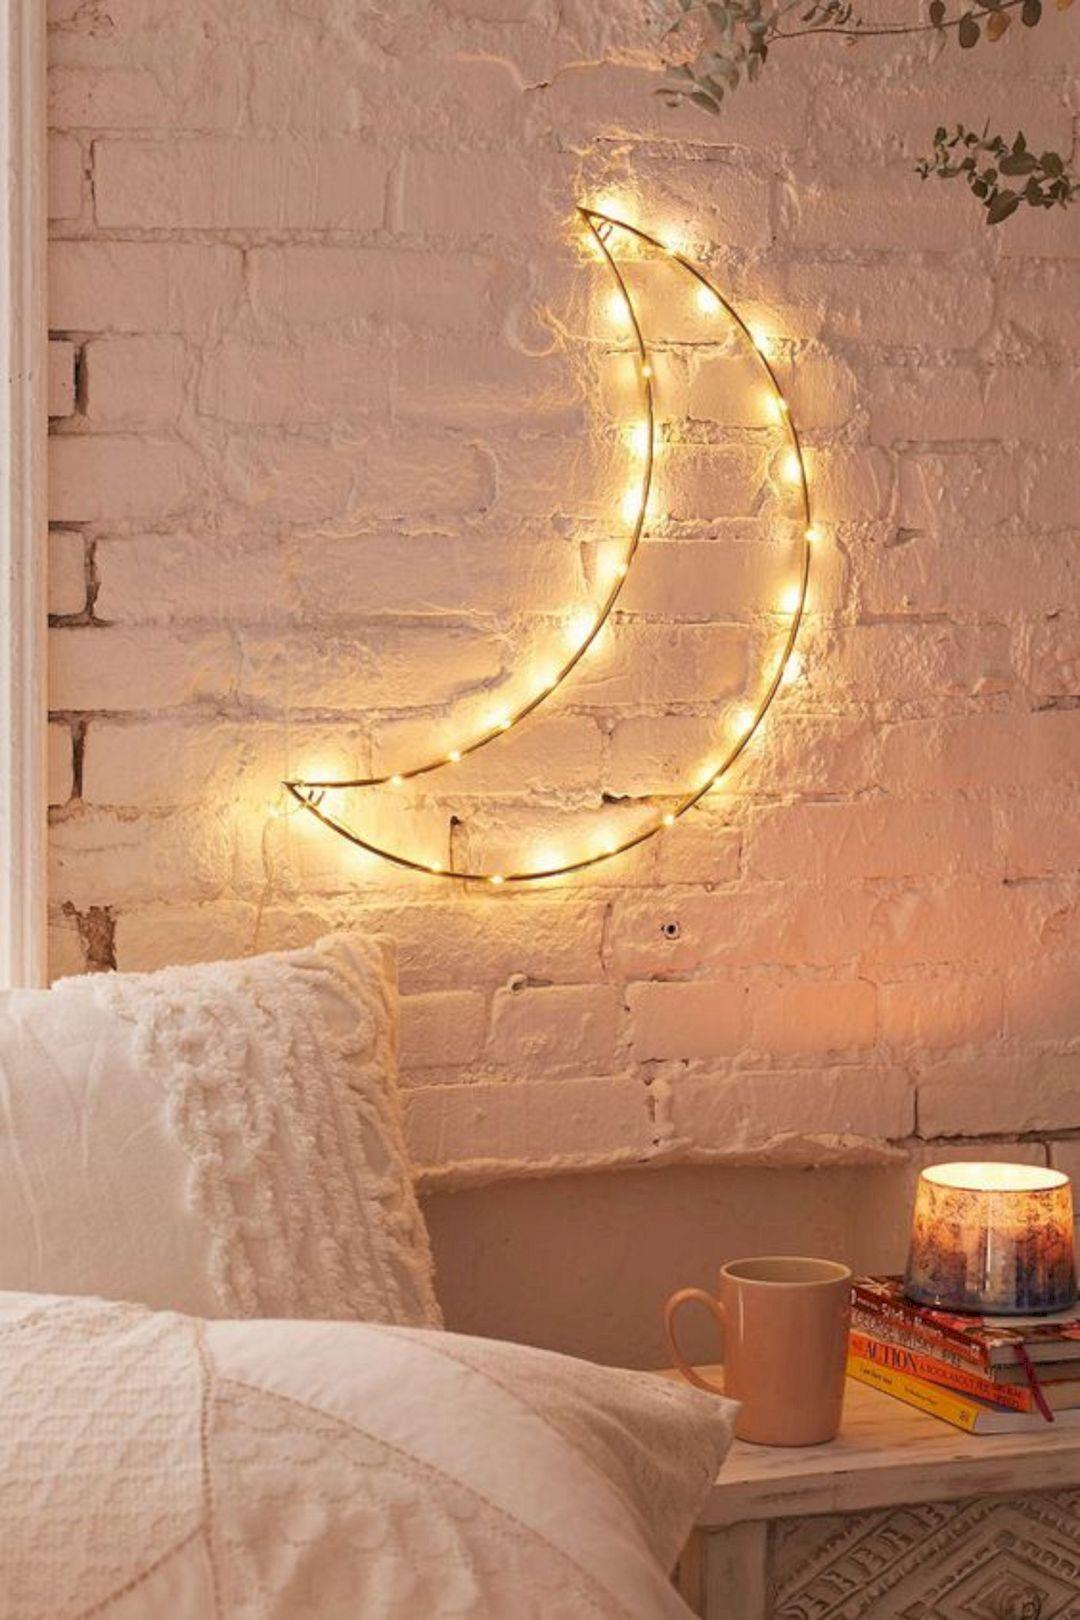 cool dorm lighting. 16 Cool Dorm Room Decorating Ideas Lighting